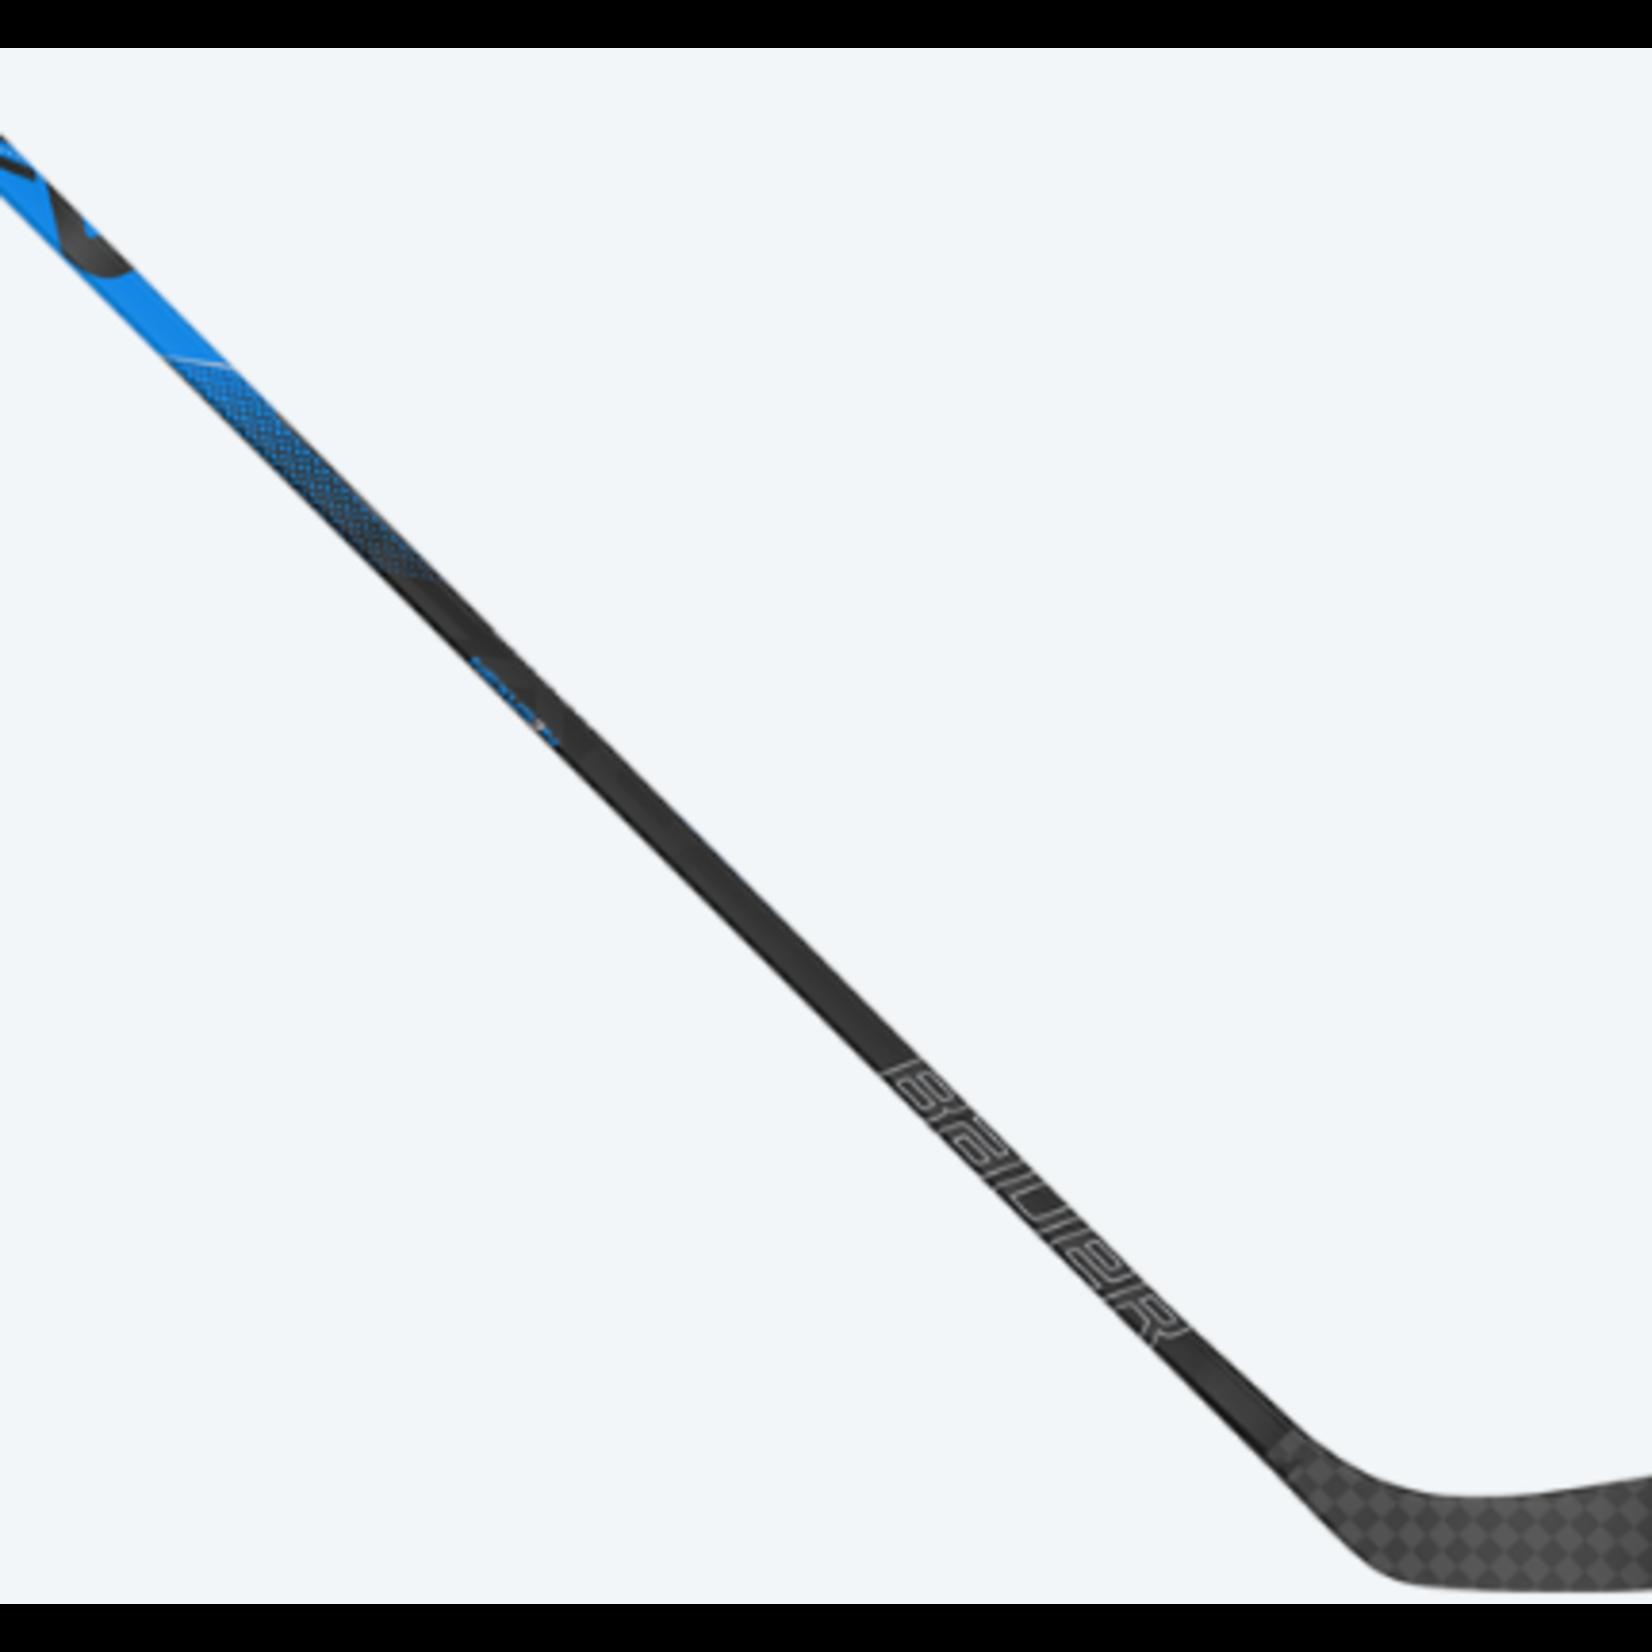 S21 Nexus 3N Grip Stick Int - 65